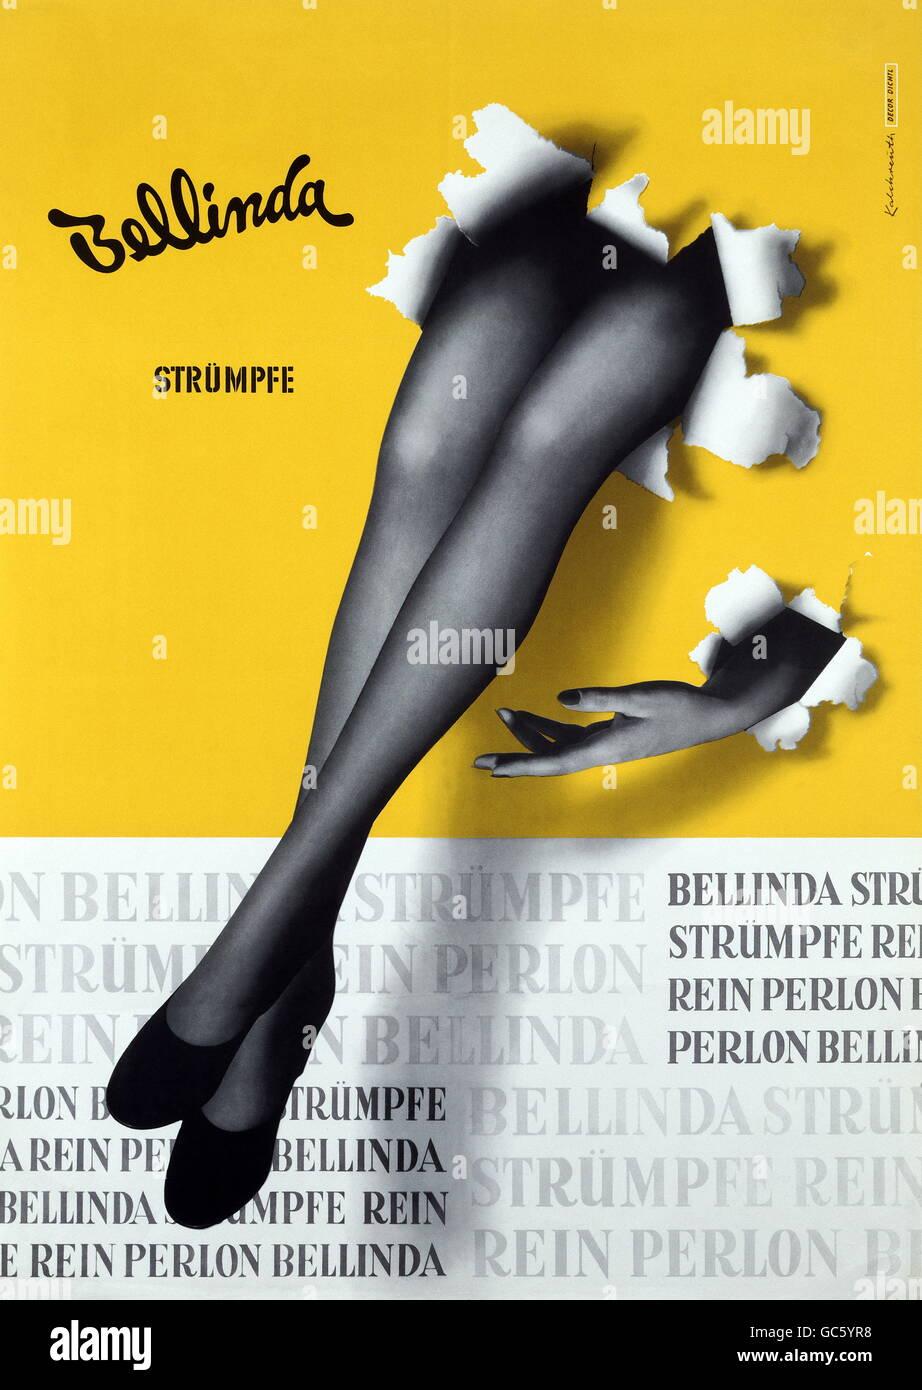 ae46597e1dc52 Ladies Stockings Stockfotos & Ladies Stockings Bilder - Seite 2 - Alamy